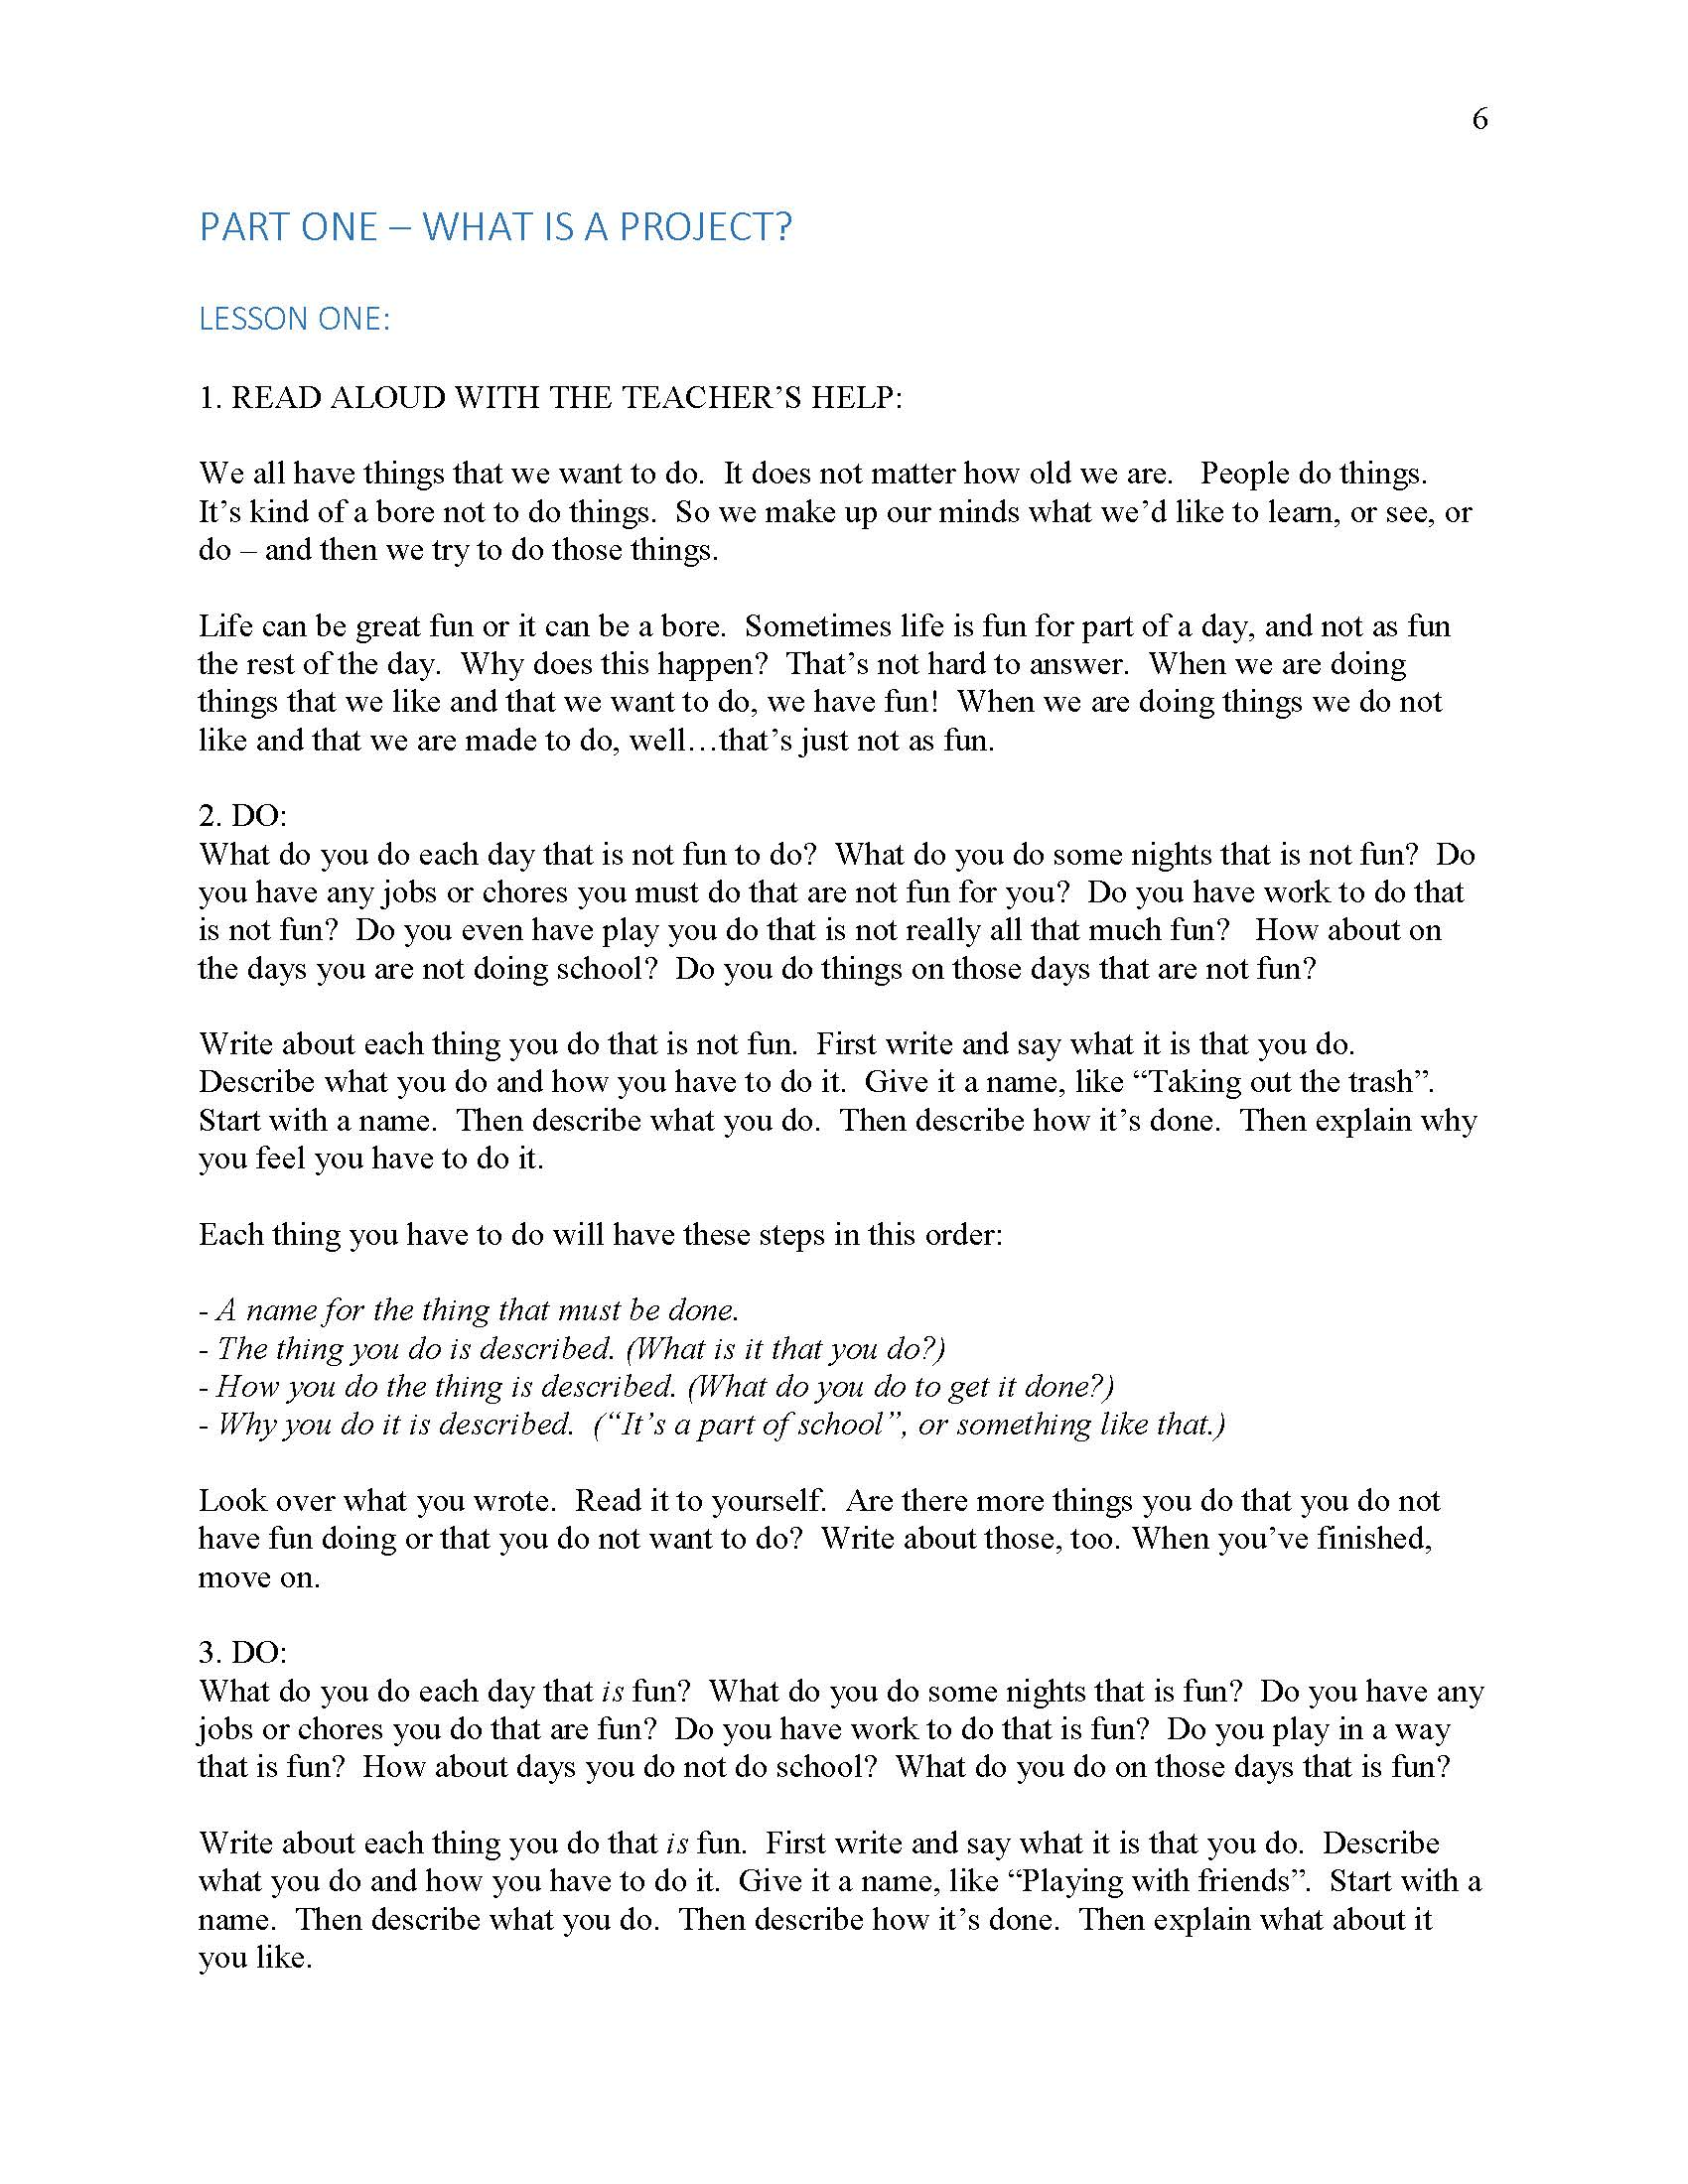 Step 1 Study & Life Skills 5 - Making Plans_Page_07.jpg